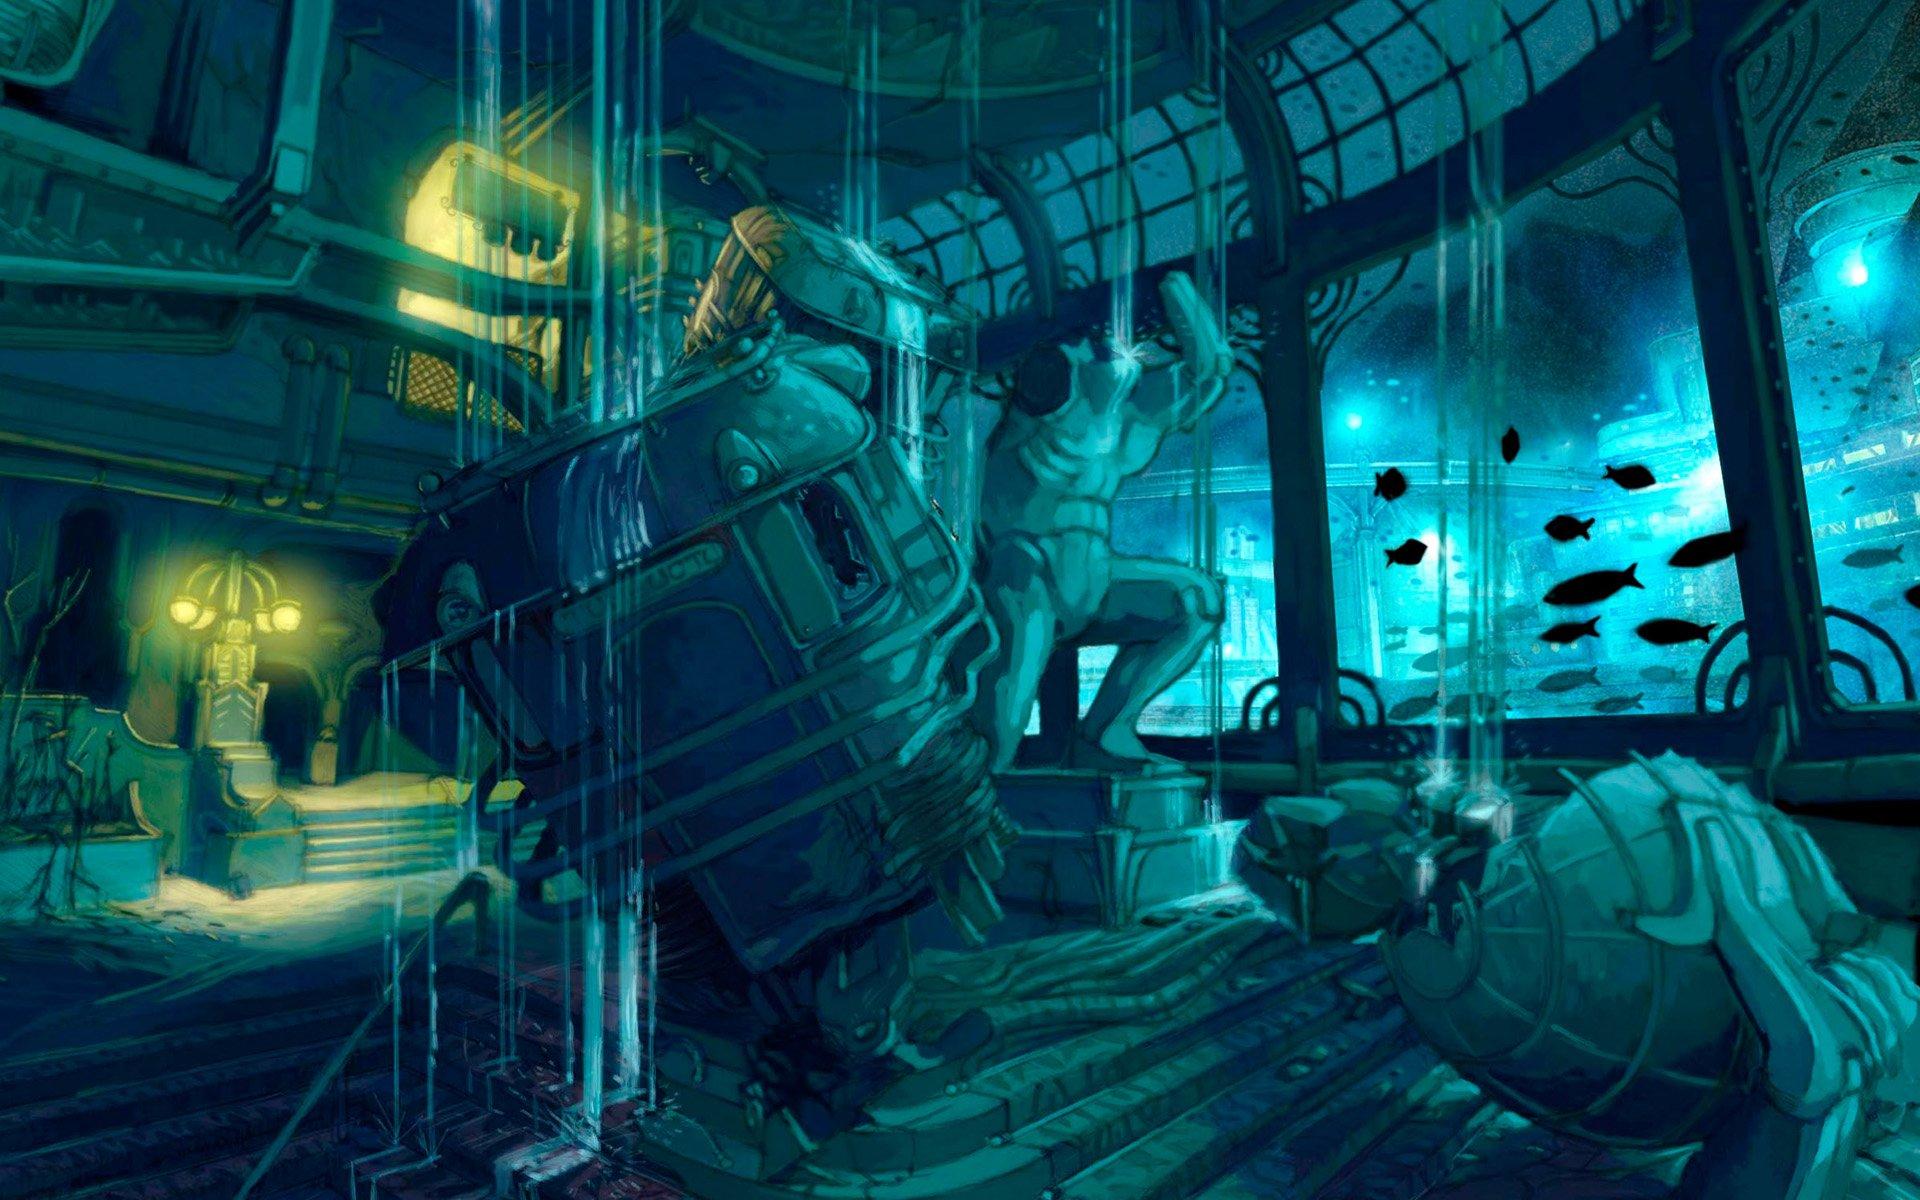 Bioshock HD Wallpaper   Background Image   1920x1200   ID ...